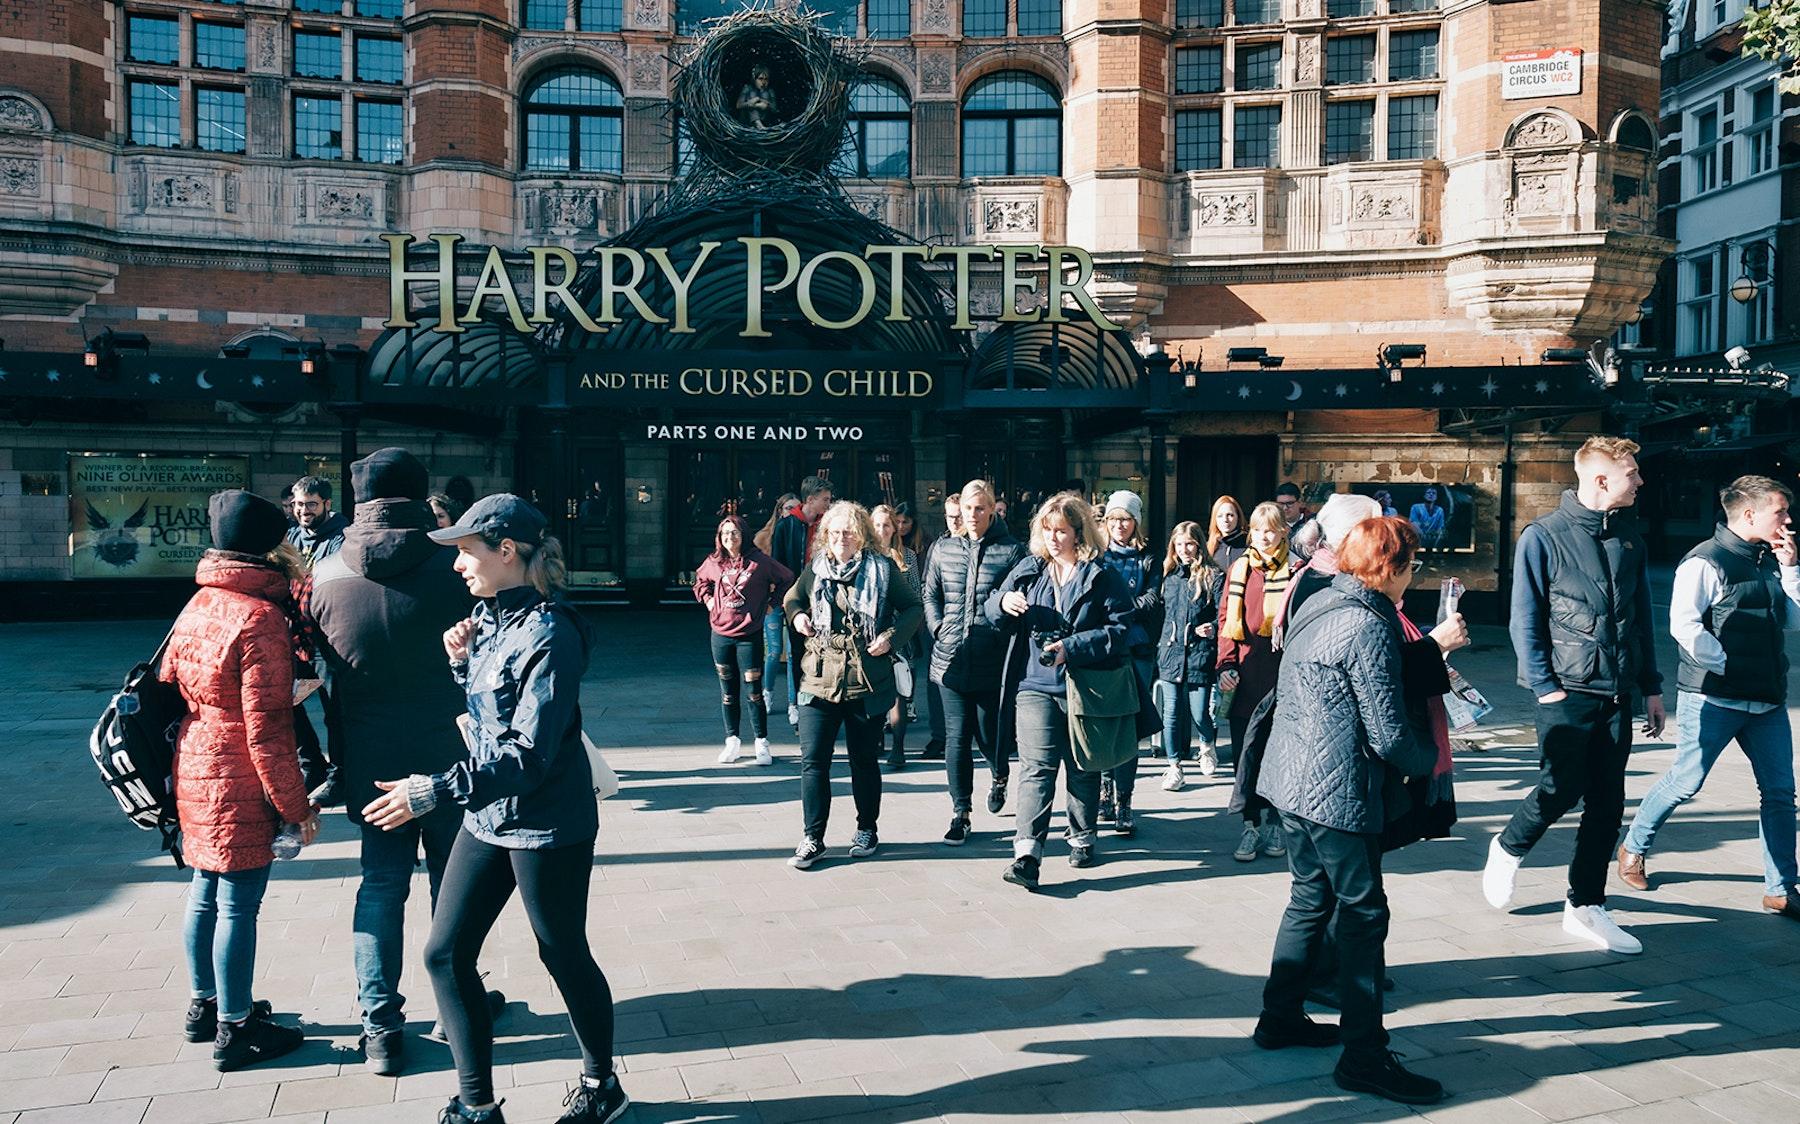 Excursão a pé de Harry Potter